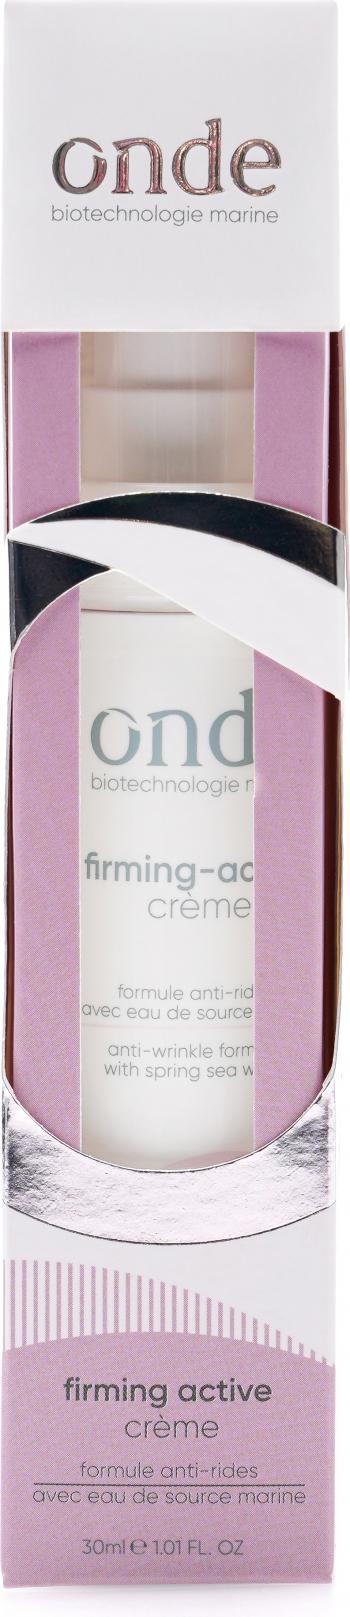 Onde Firming-Active Creme cu apa de origine marina 30ml